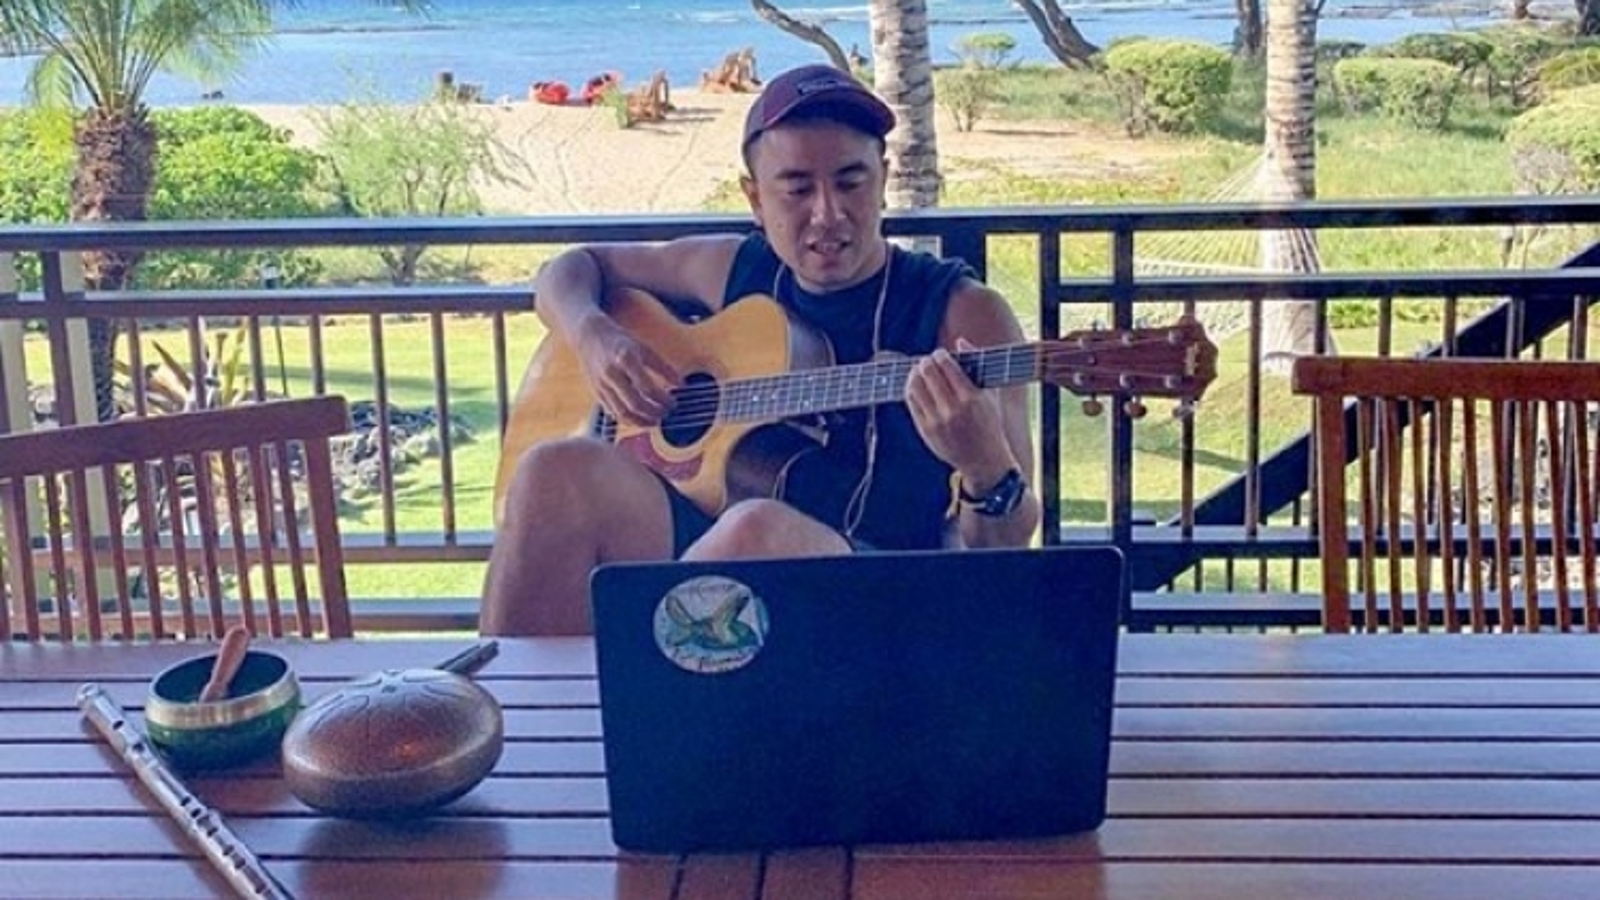 Vietnamese American jazz artist enthuses over music teaching